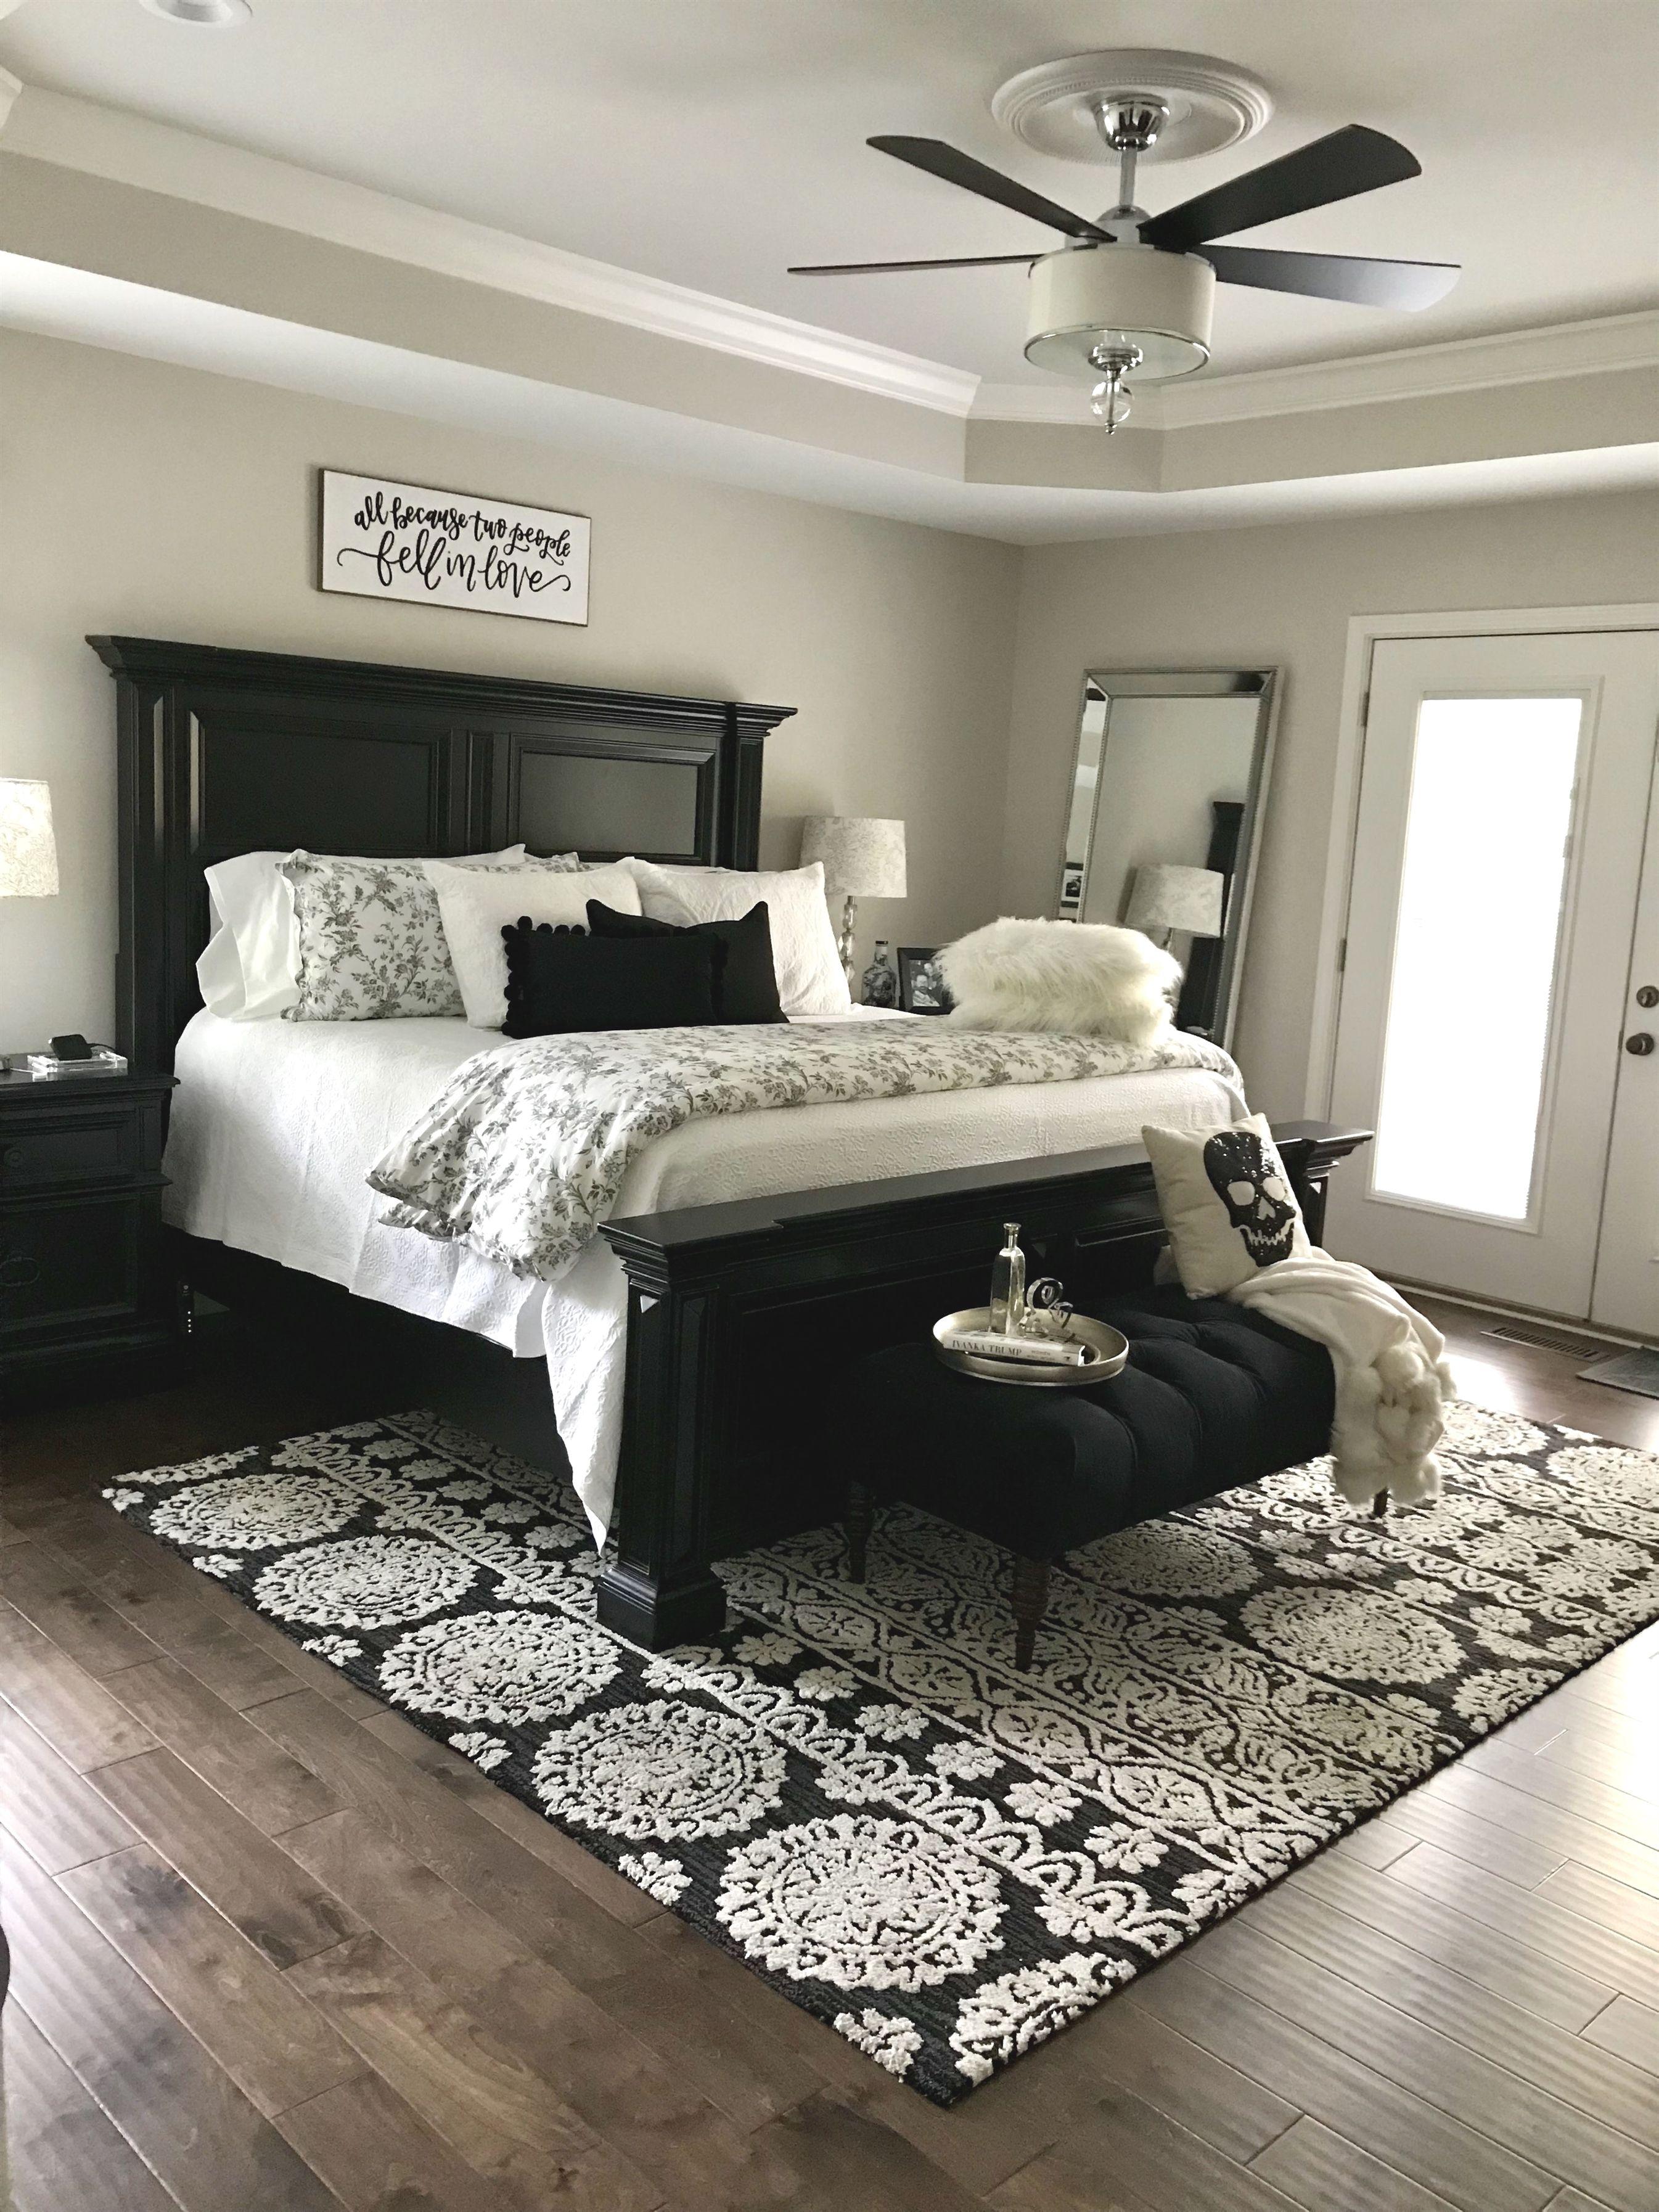 Black And White Master Bedroom Design Bedroomdecoratingideas White Master Bedroom White Living Room Decor Master Bedrooms Decor Bedroom design ideas black